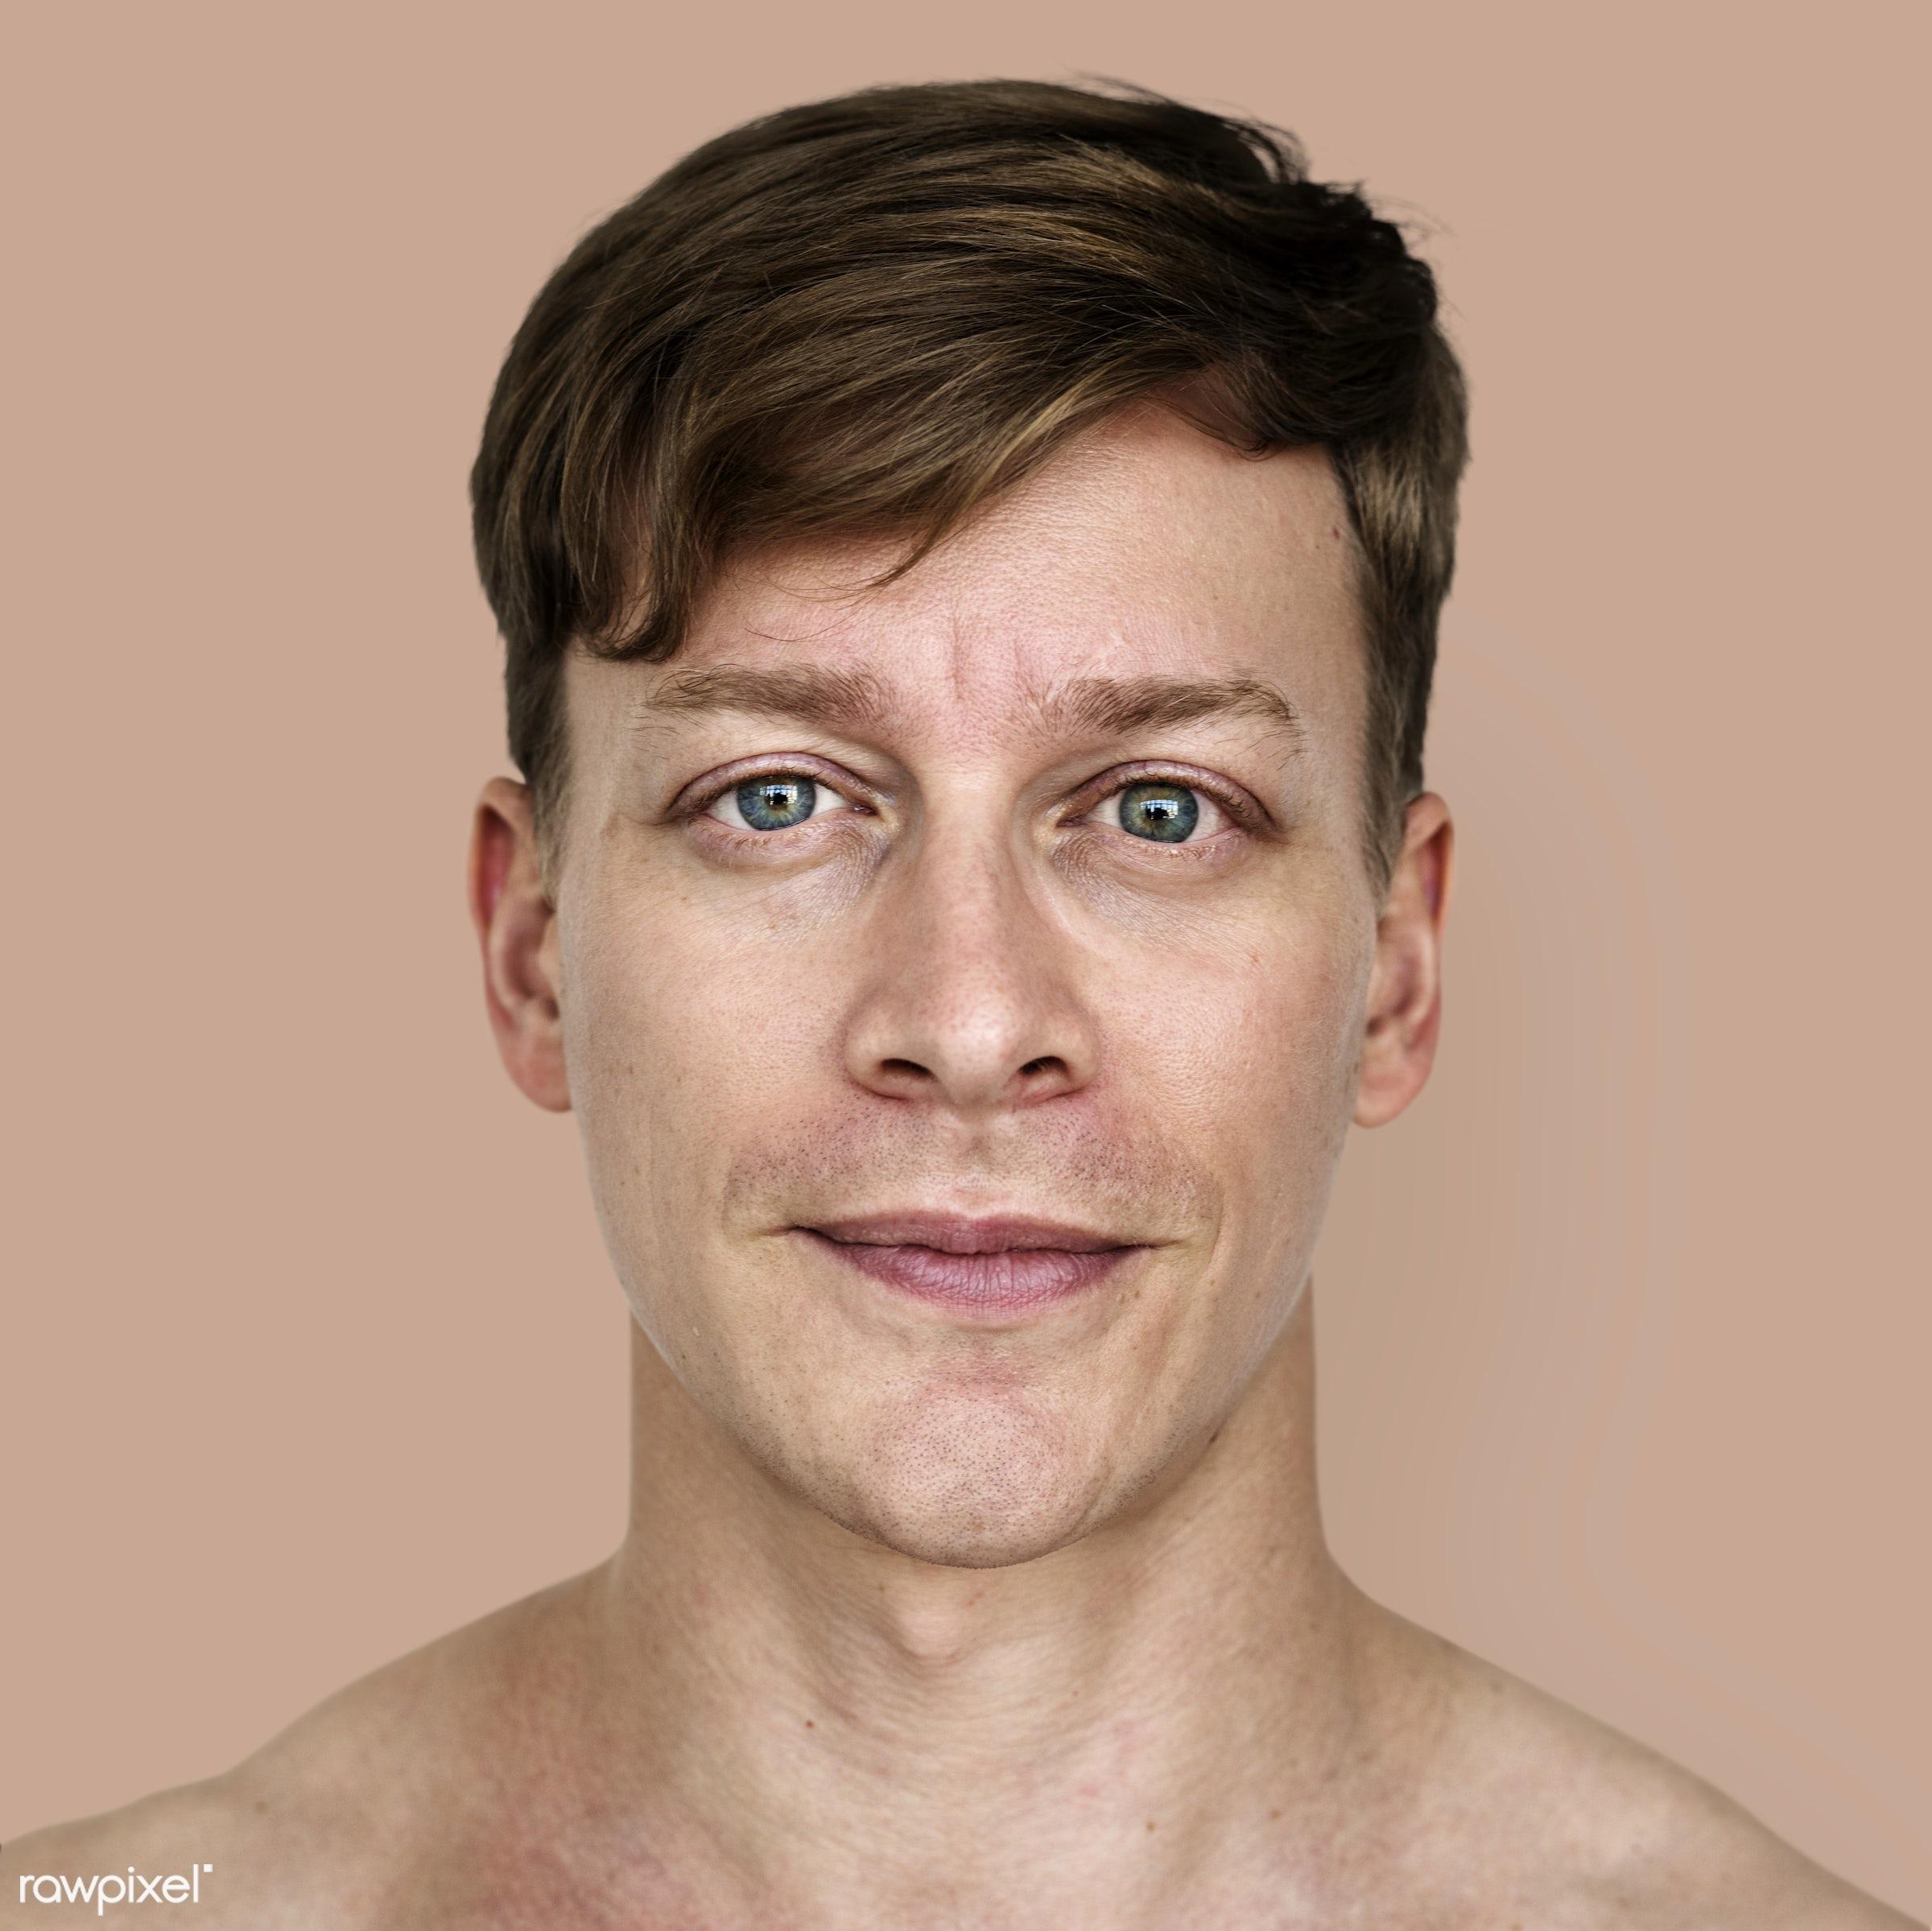 Portrait of an Austrian man - adult, alone, american, austria, austrian, cheerful, closeup, content, europe, european,...